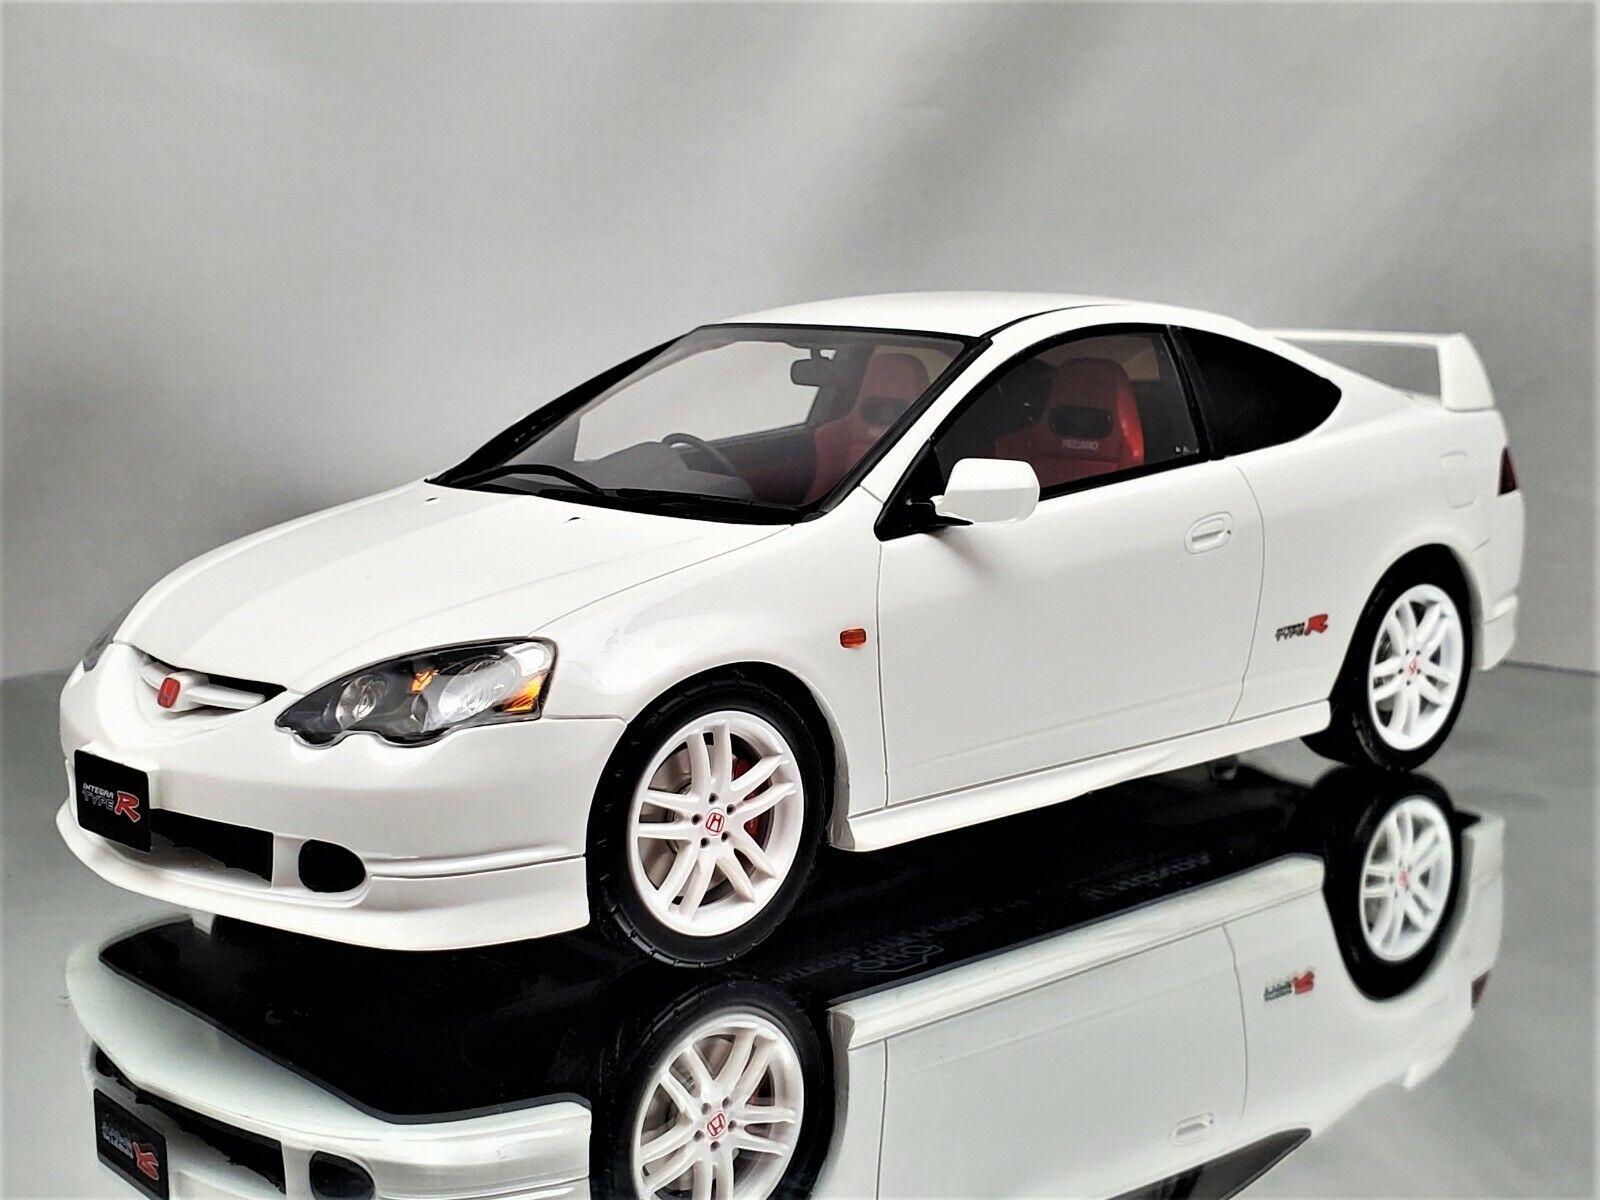 1 18 Autoart Honda Integra Type R Mugen Version 2001 73251 Acura Rsx Dc5 Type R For Sale Online Ebay